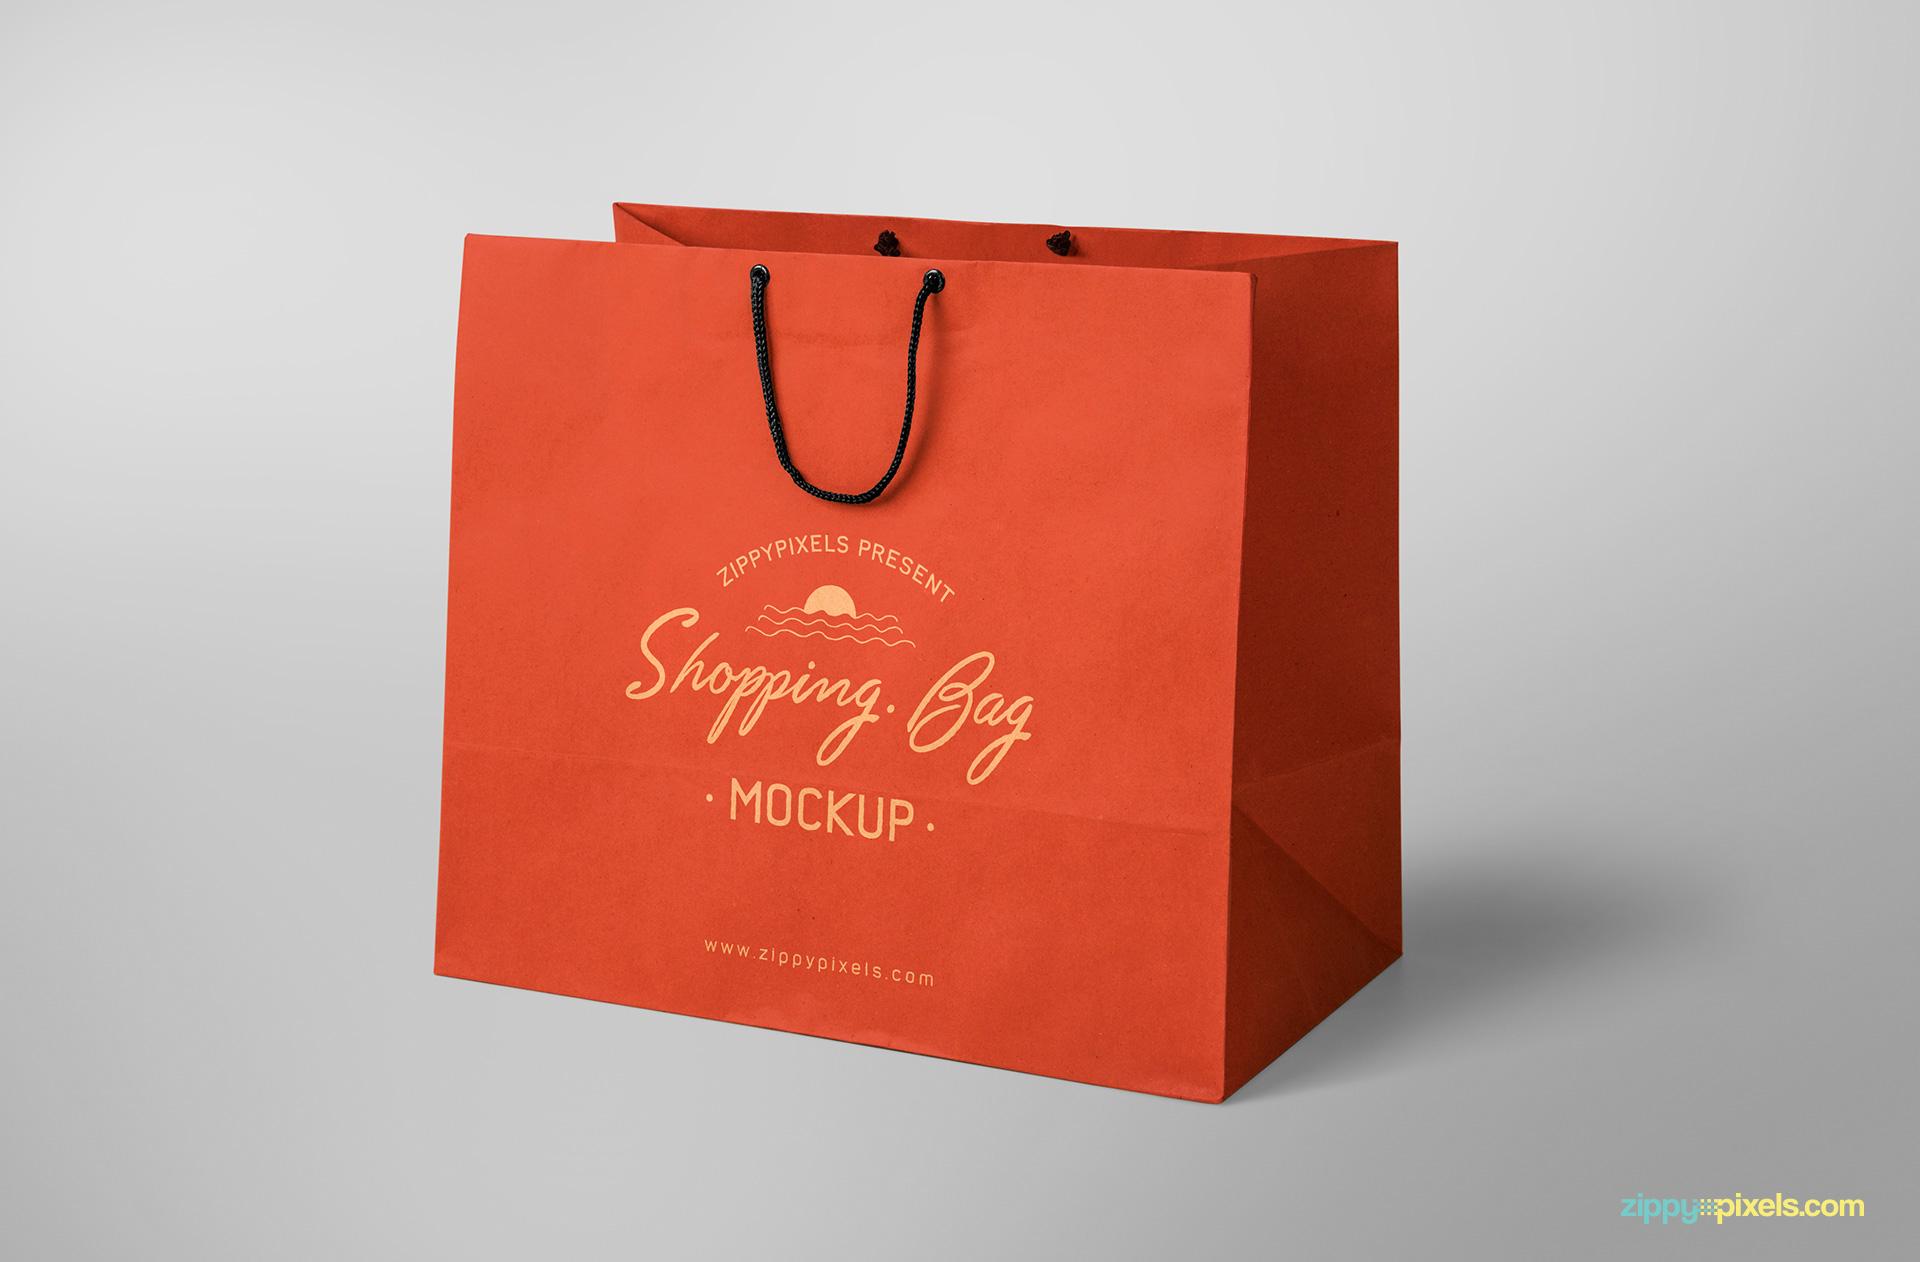 free modern shopping bag mockup psd for presentation 2018. Free Shopping Bag Mockup Zippypixels